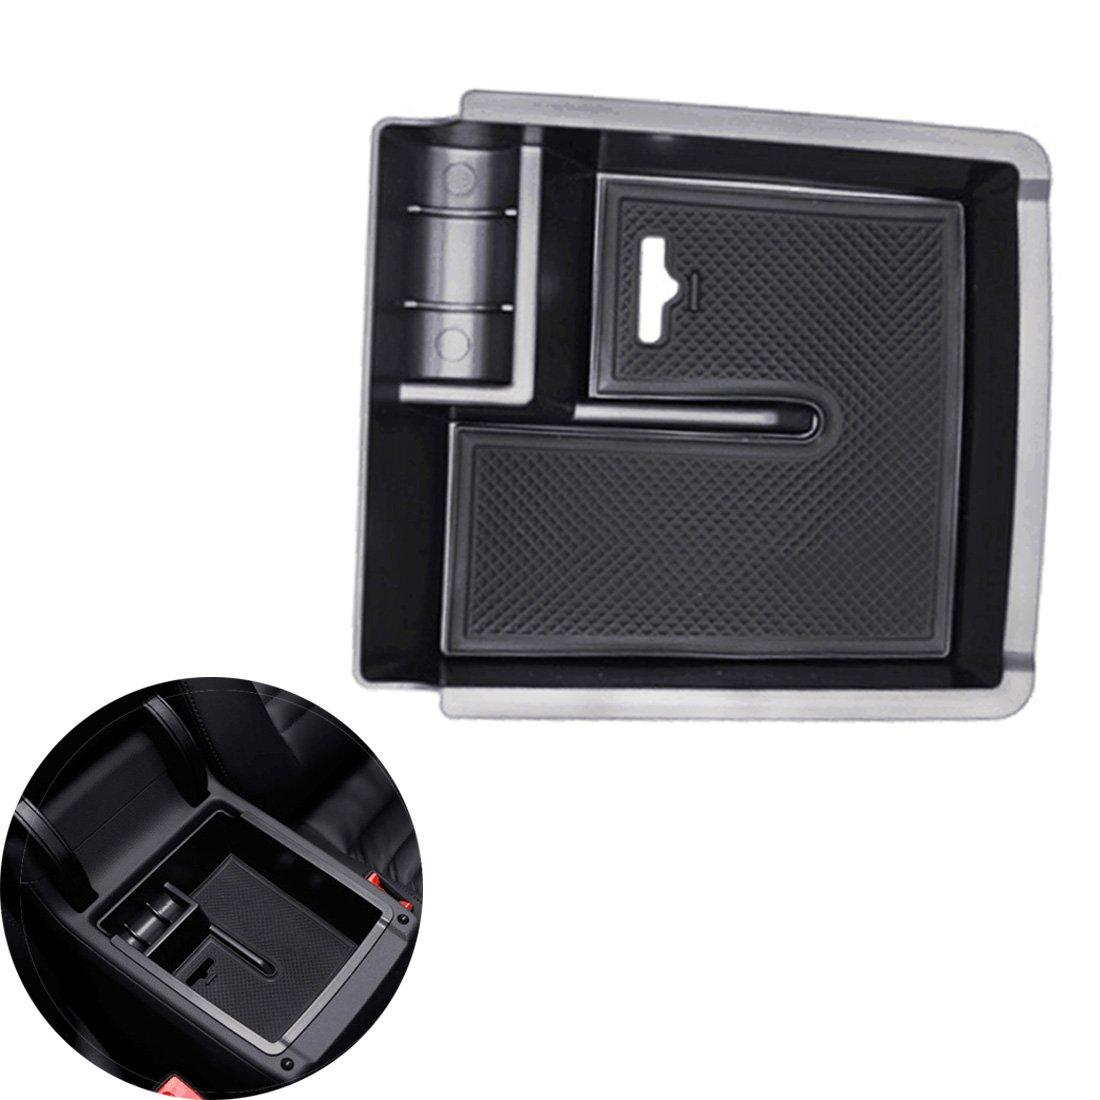 LITTOU Caja de apoyabrazos central Consola reposabrazos Caja Guante Caja para Magotan B8,Passat B8: Amazon.es: Coche y moto